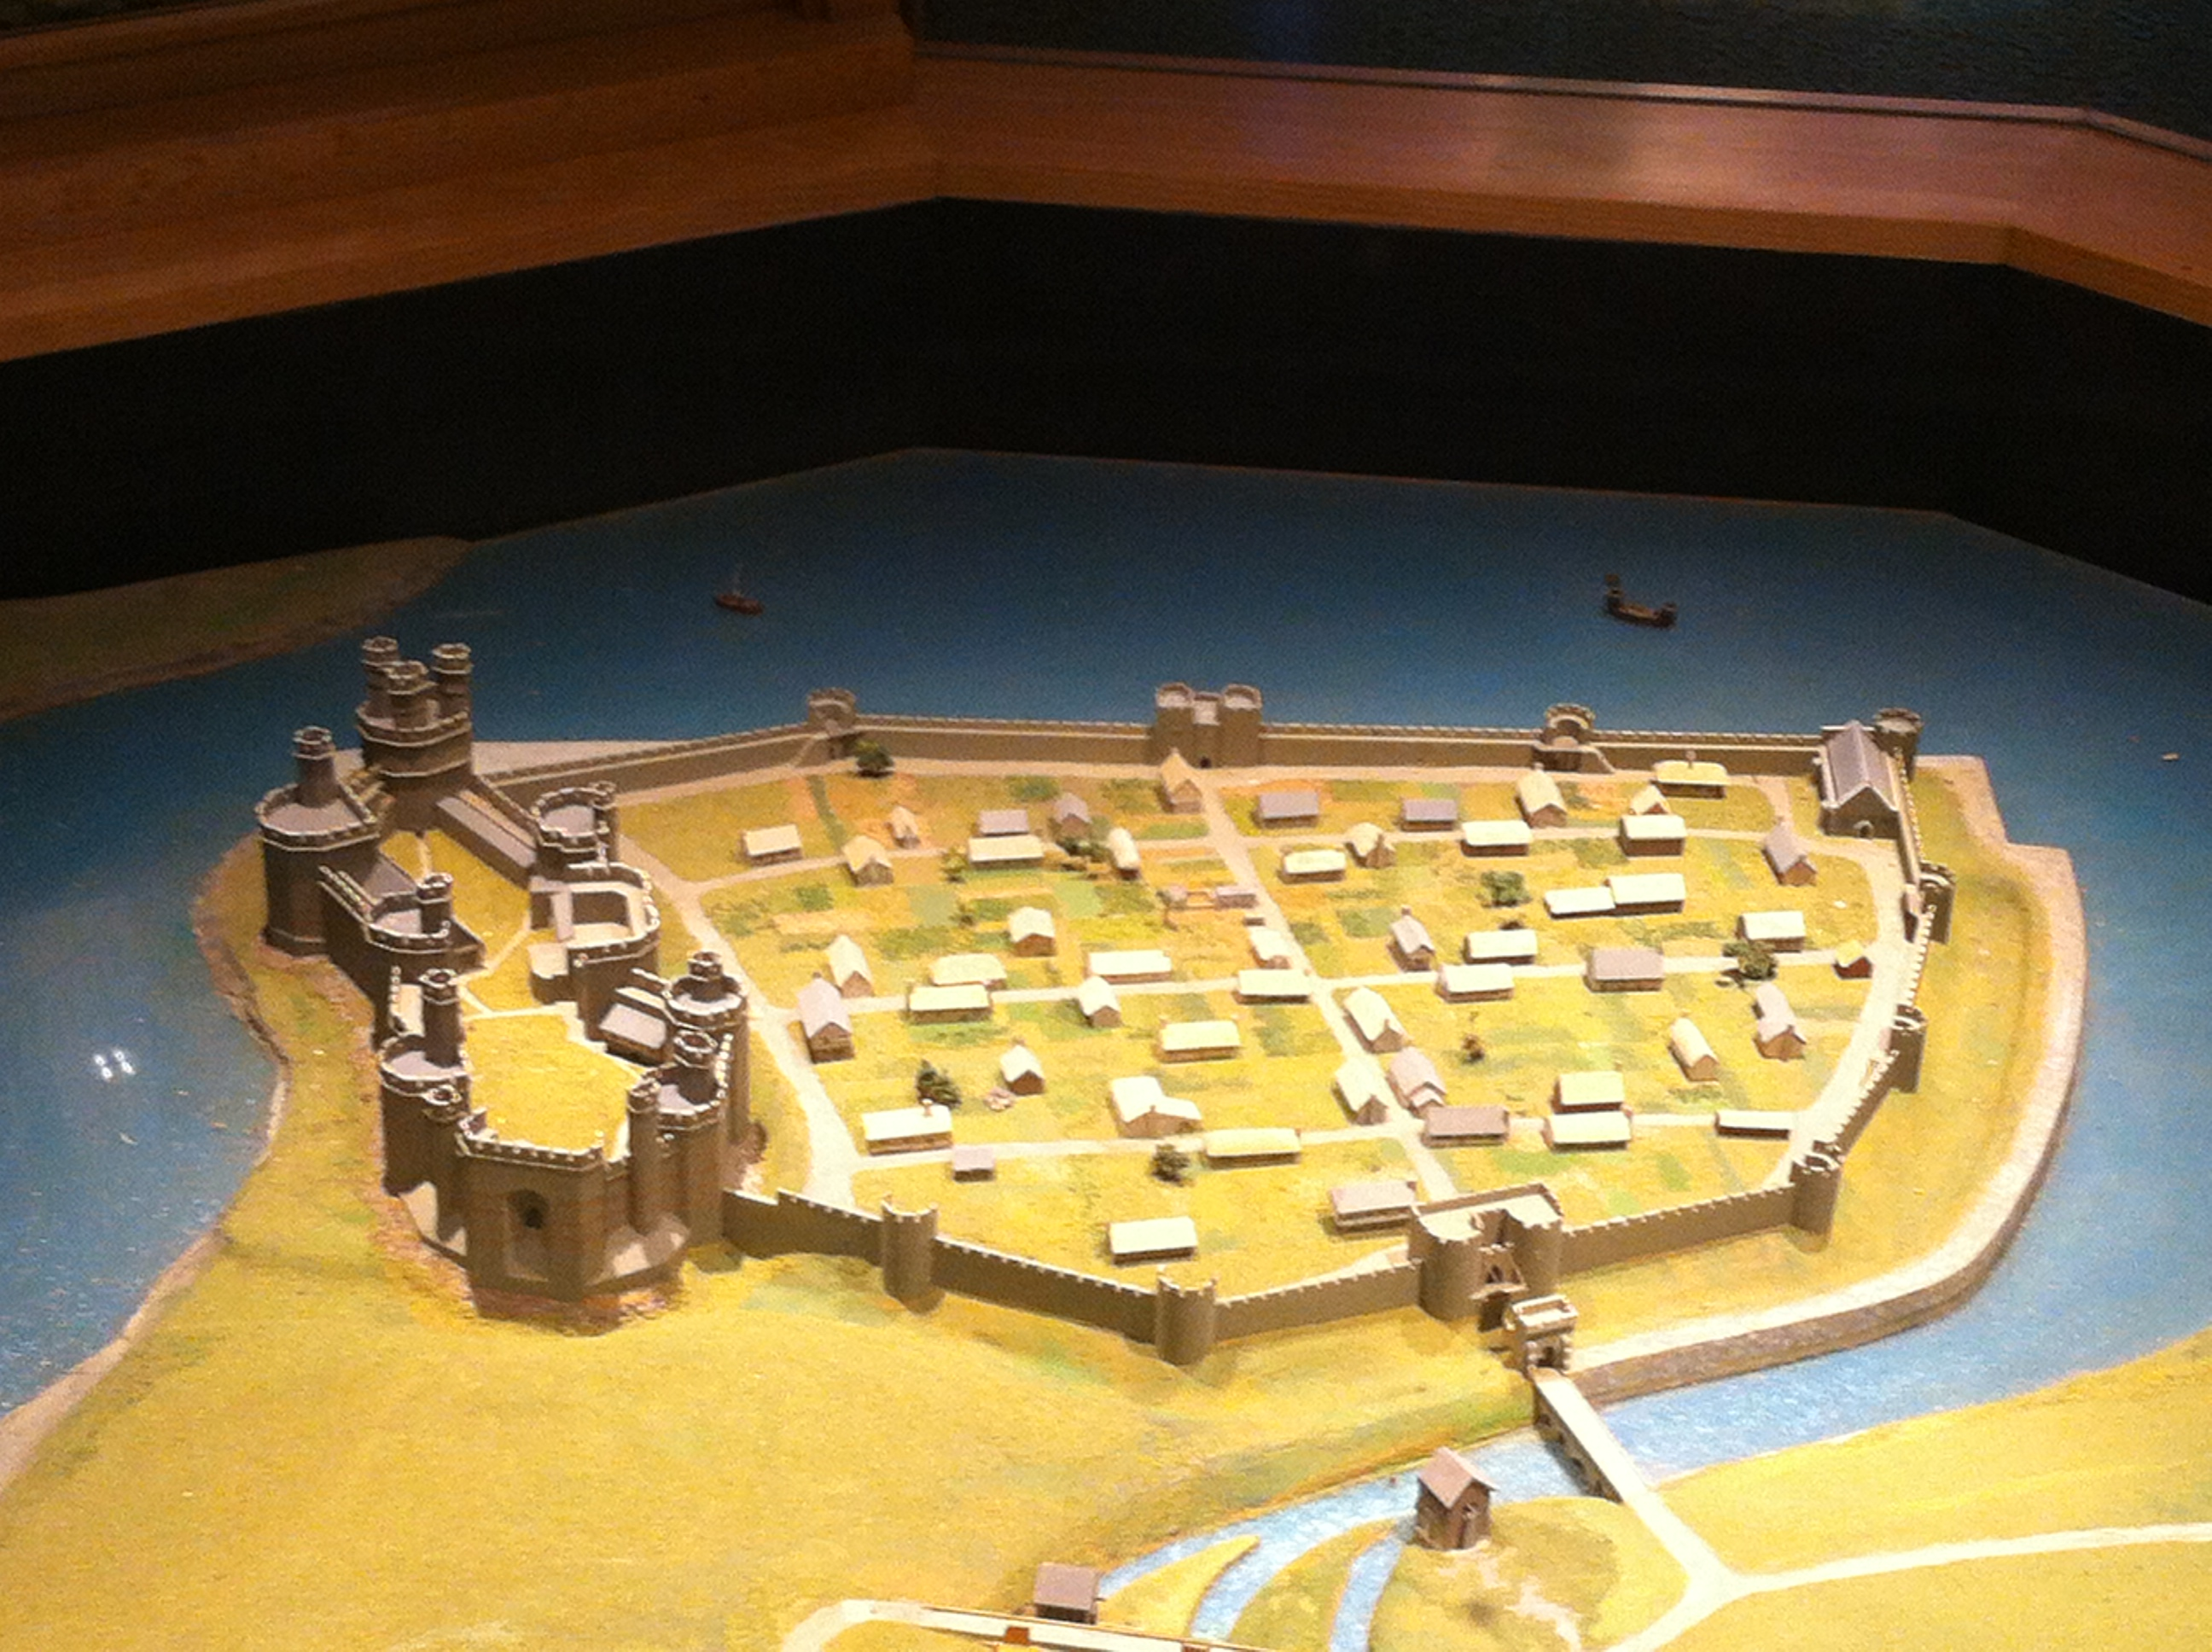 Caenarfon in miniature. Anyone for Warmaster?